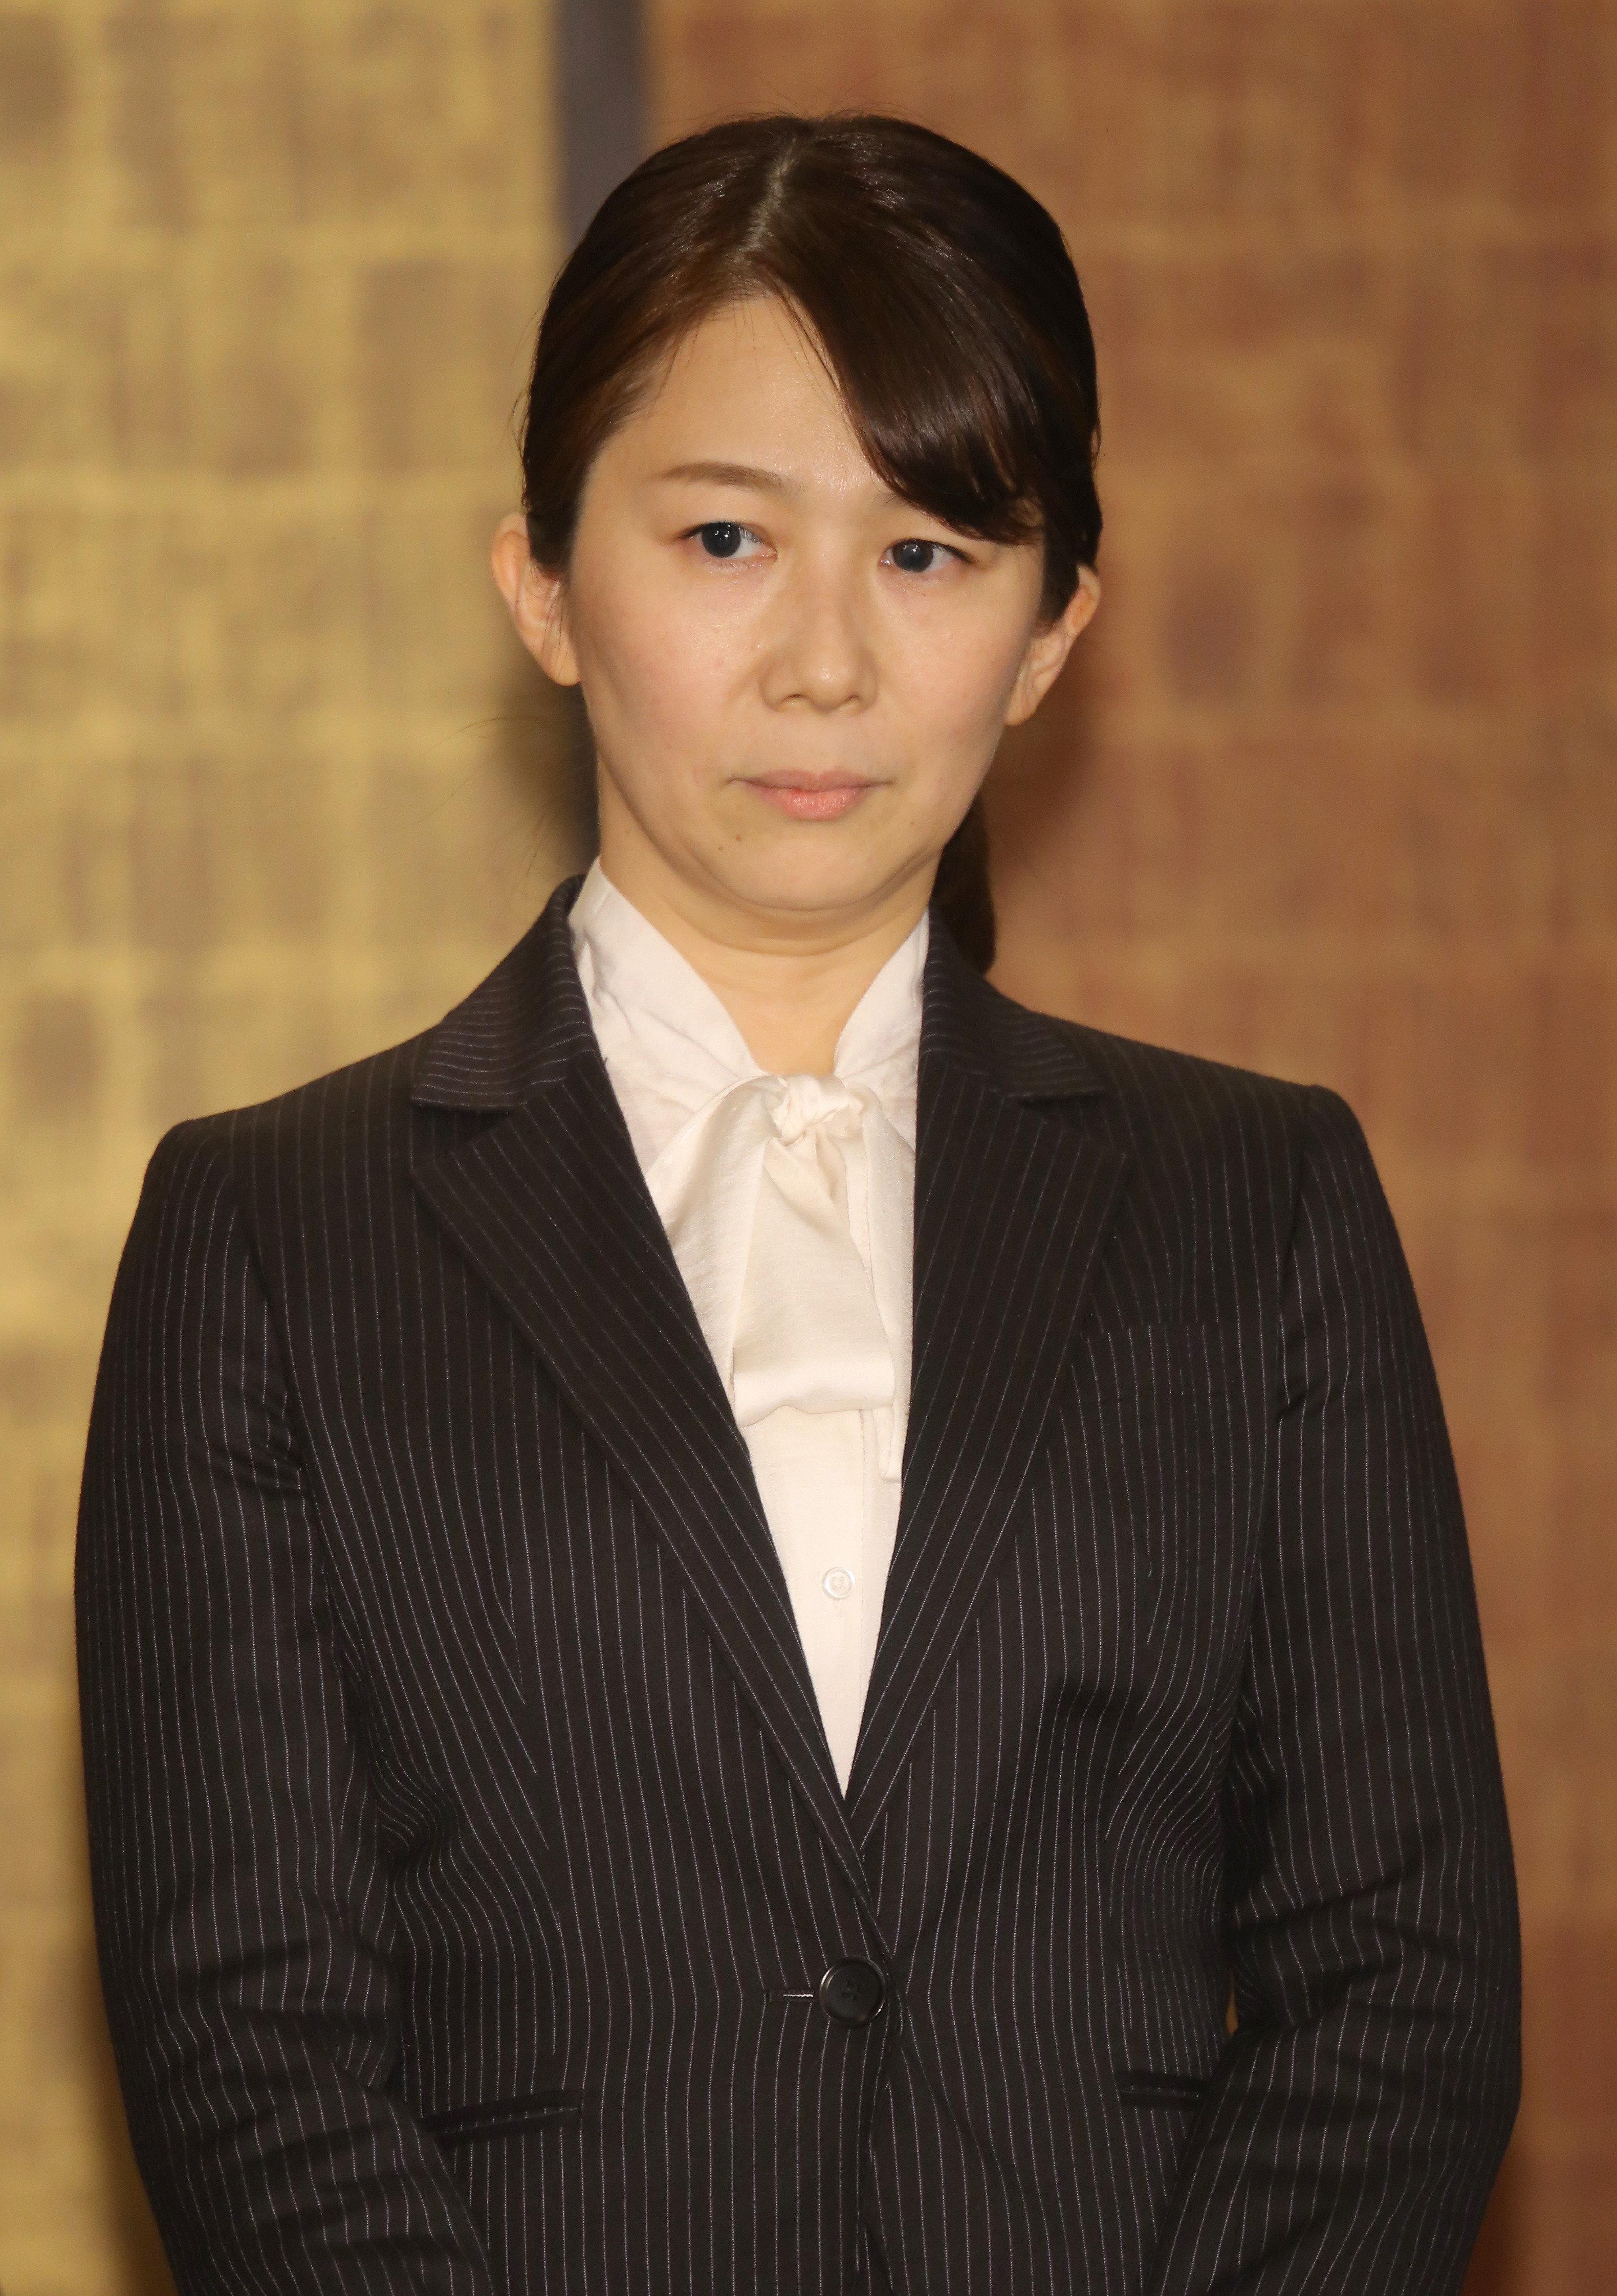 NGT48劇場支配人・早川氏、千秋楽公演前に壇上から謝罪「未熟な部分があること痛感」